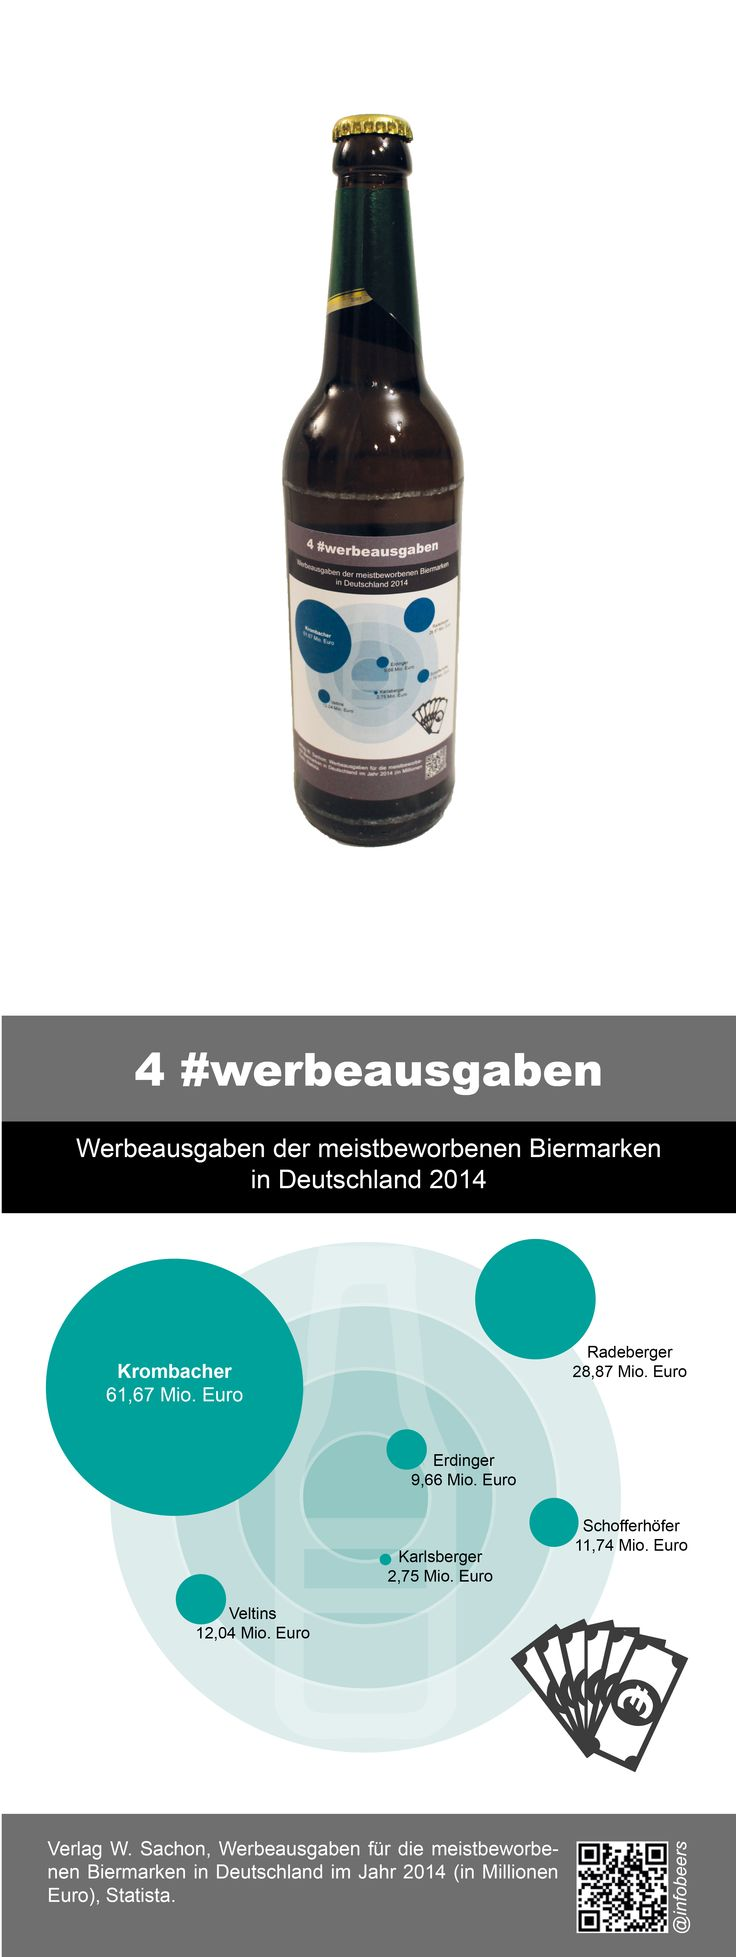 @infobeers, #koelsch, #werbeausgaben, #bier, #gilden, #biermarken